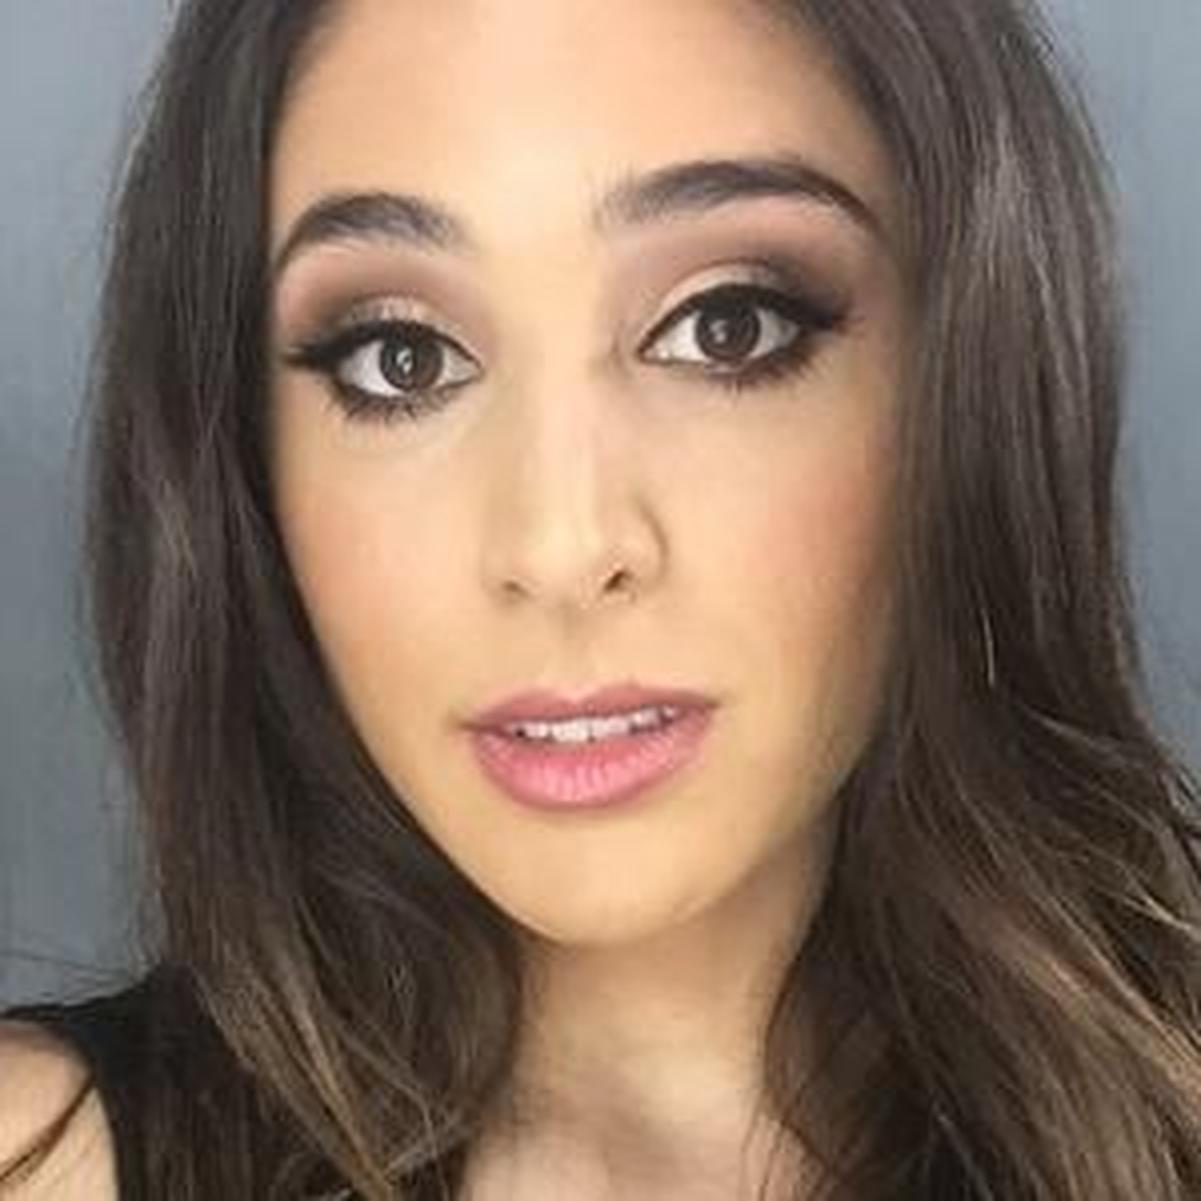 Danielle Robay